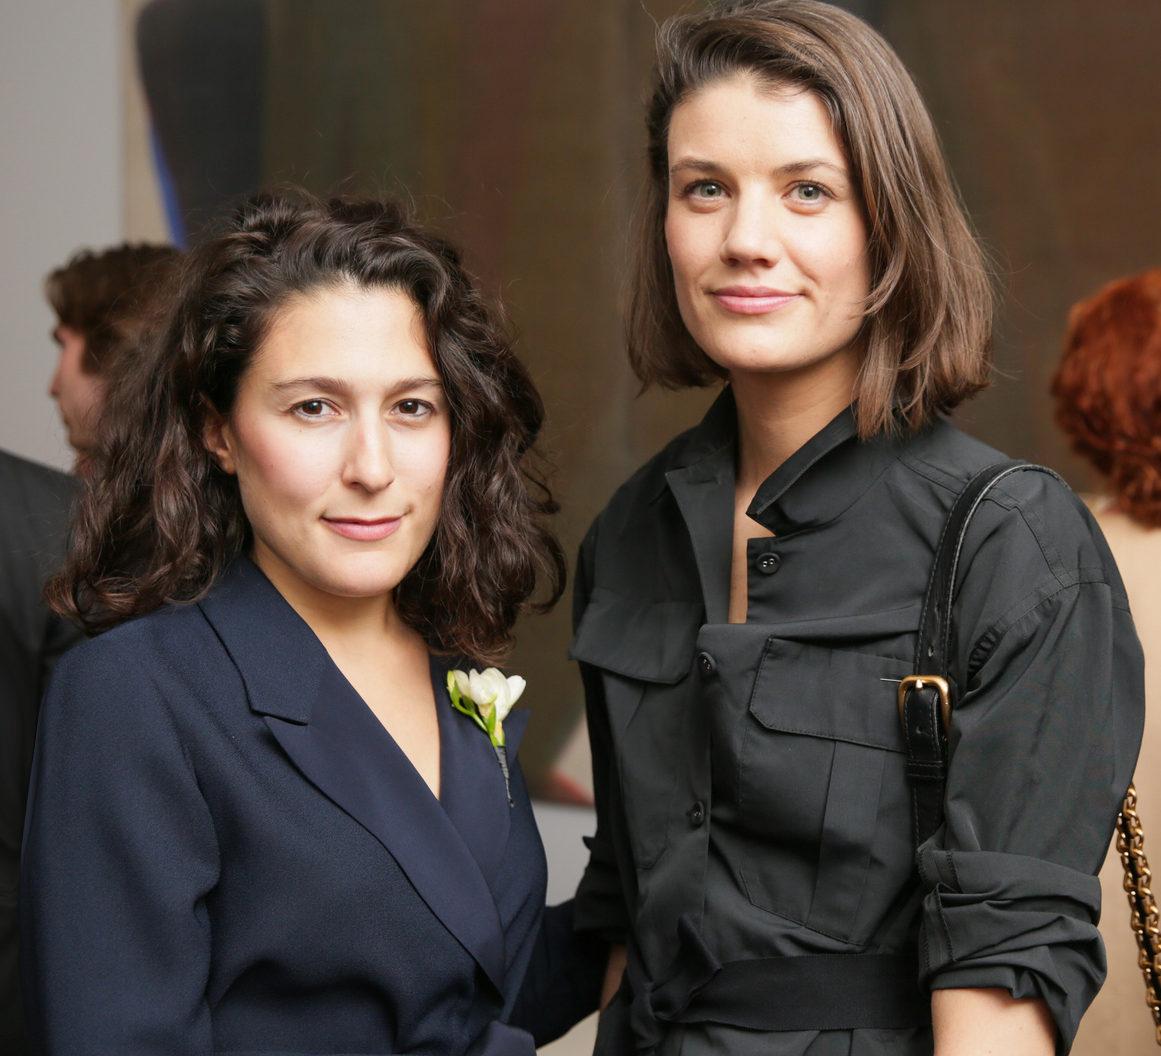 Britt Cosgrove and Marina Polo of Svilu